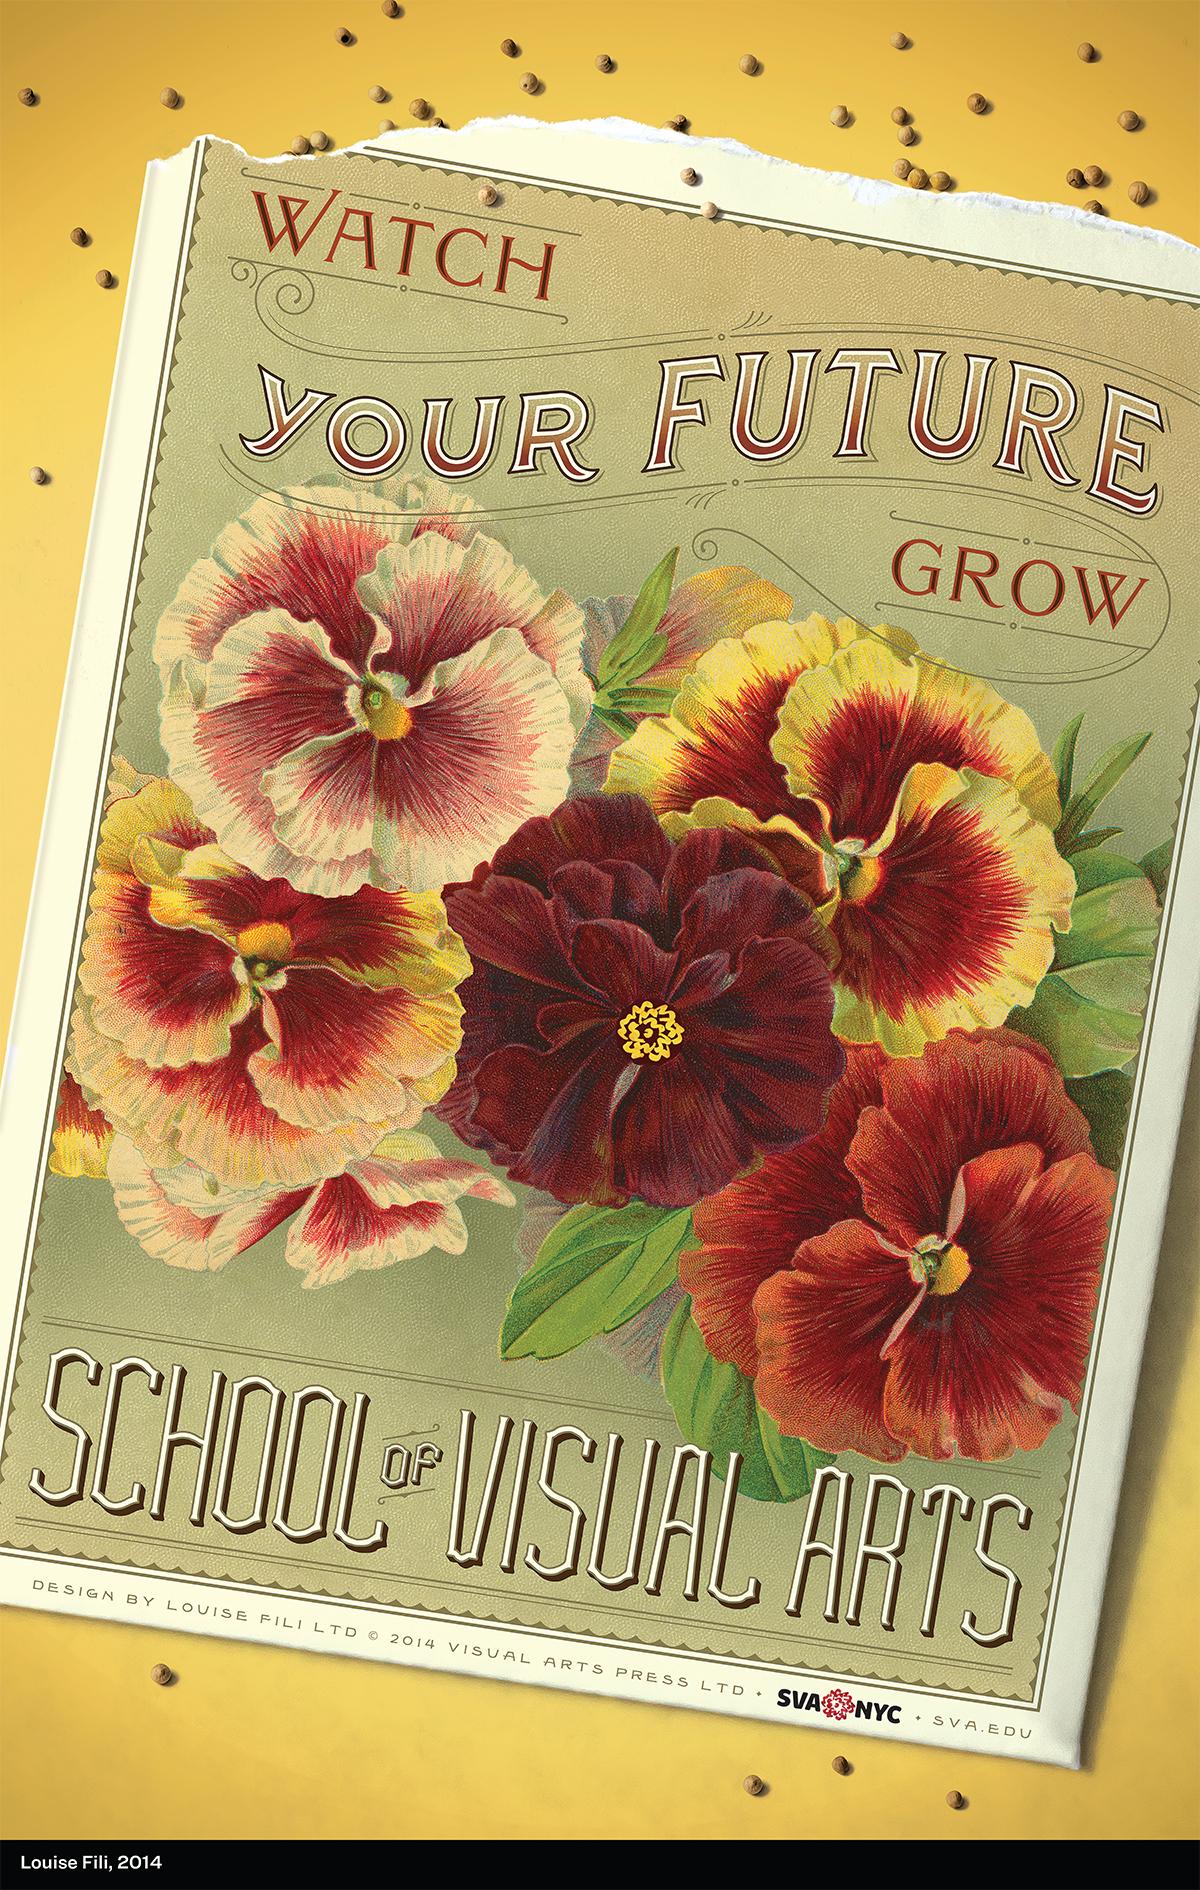 Poster advertising School of Visual Arts